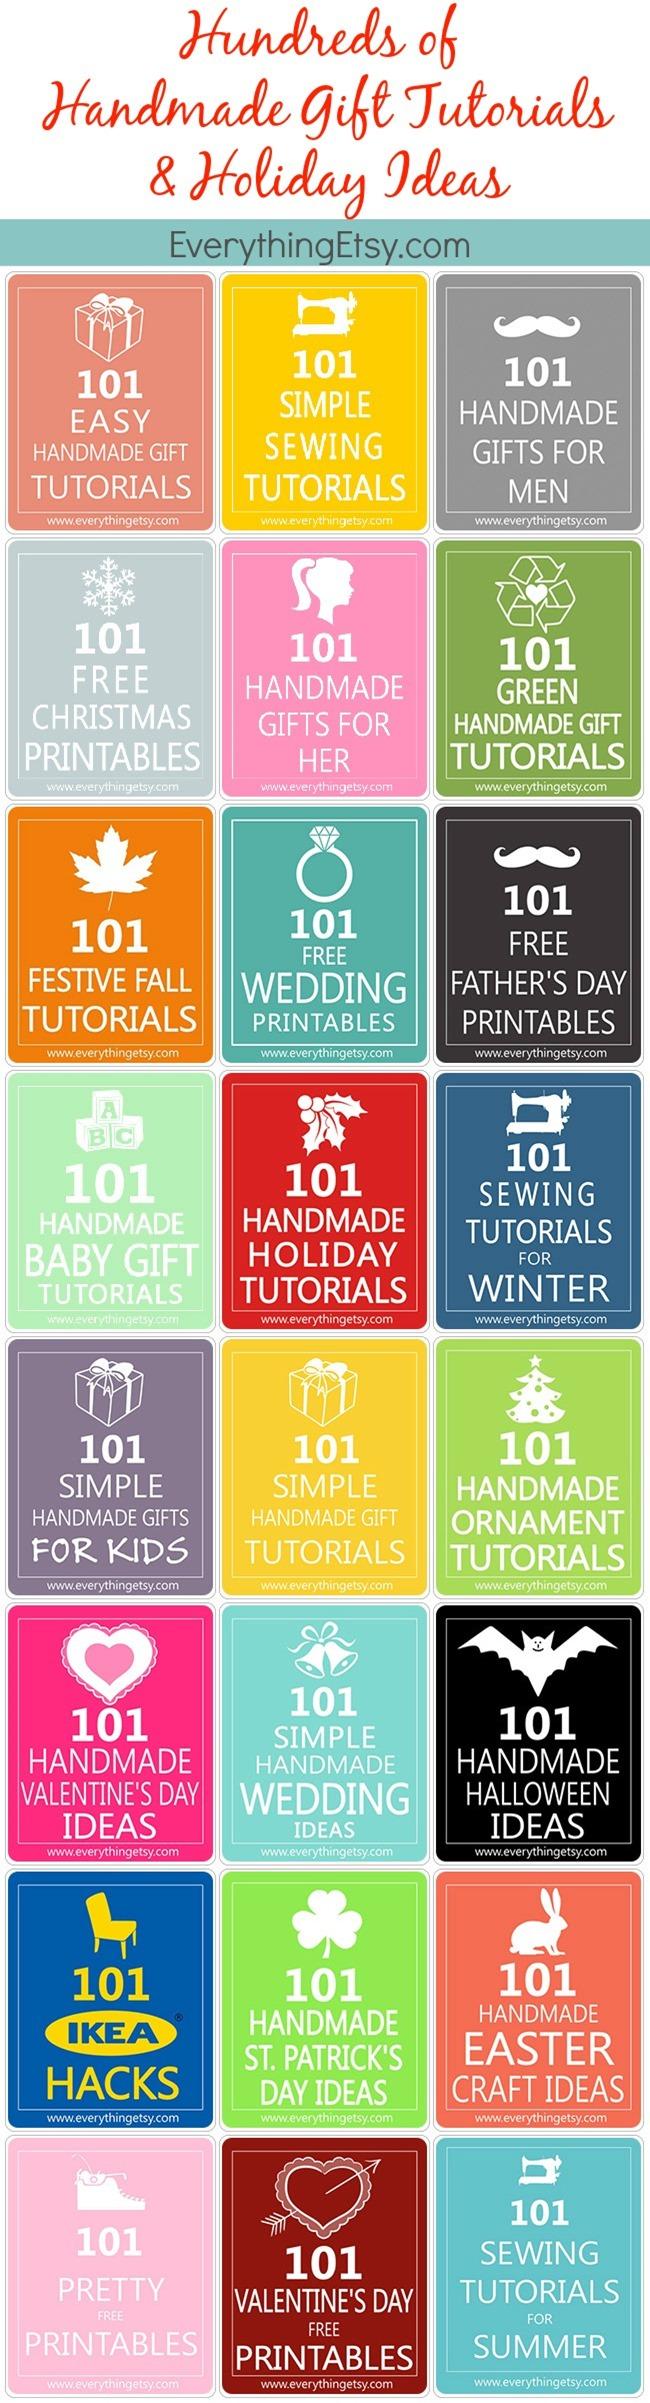 Handmade Gift Tutorials & Holiday Ideas...Hundreds of them on EverythingEtsy.com